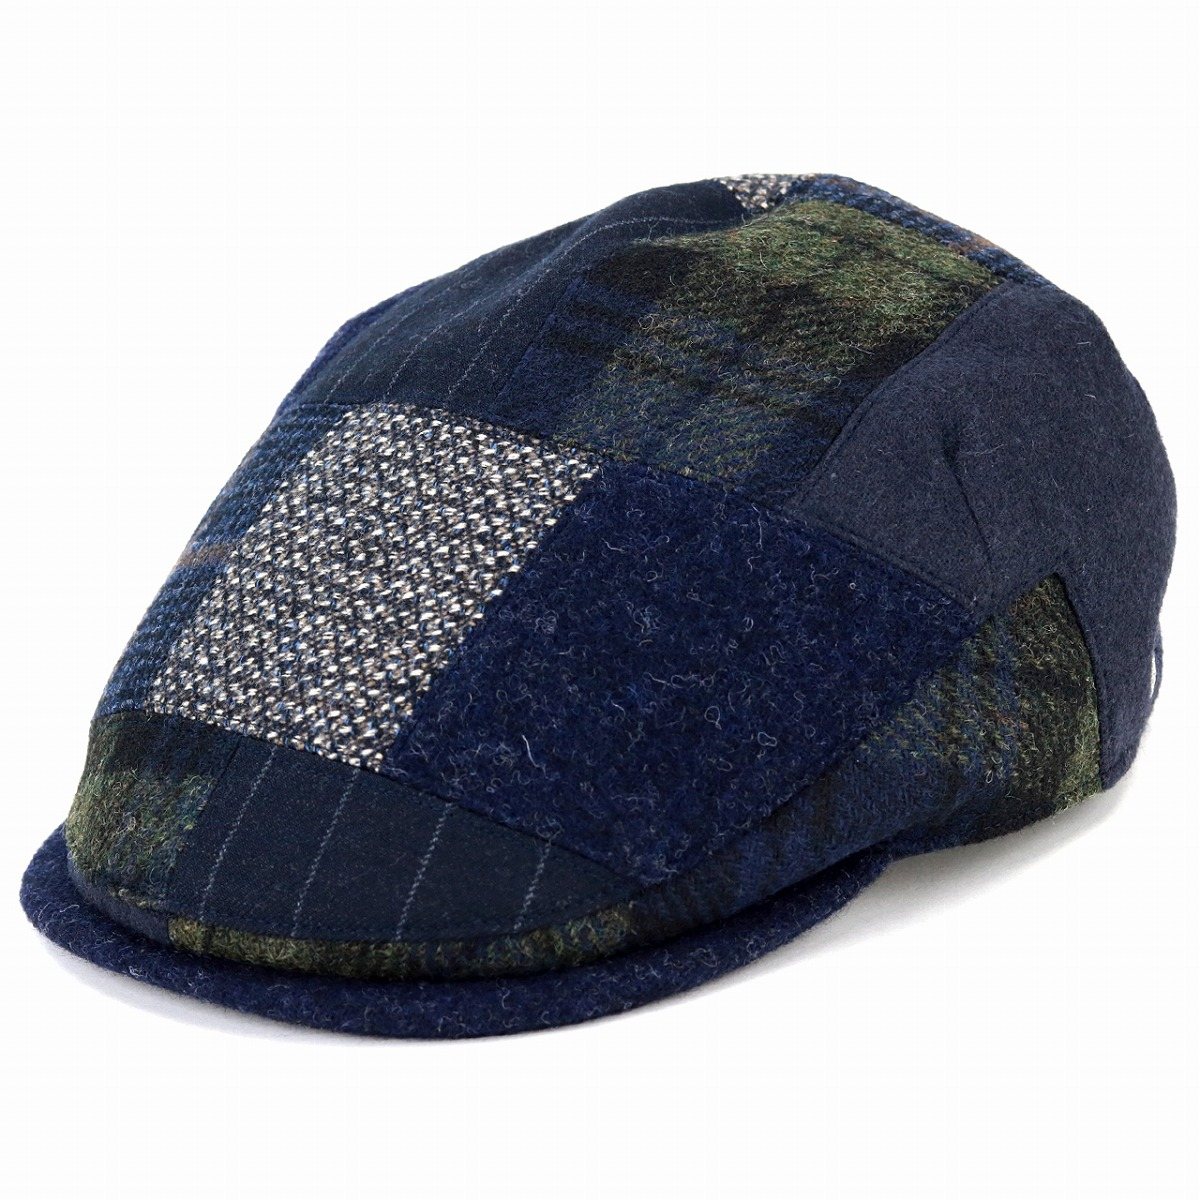 eb3ba9099de Casual hunting cap hat fashion U.K. brand   dark blue navy  ivy cap  man  Christmas present hat made in DAKS hunting cap patchwork men hat Daks  hunting cap ...